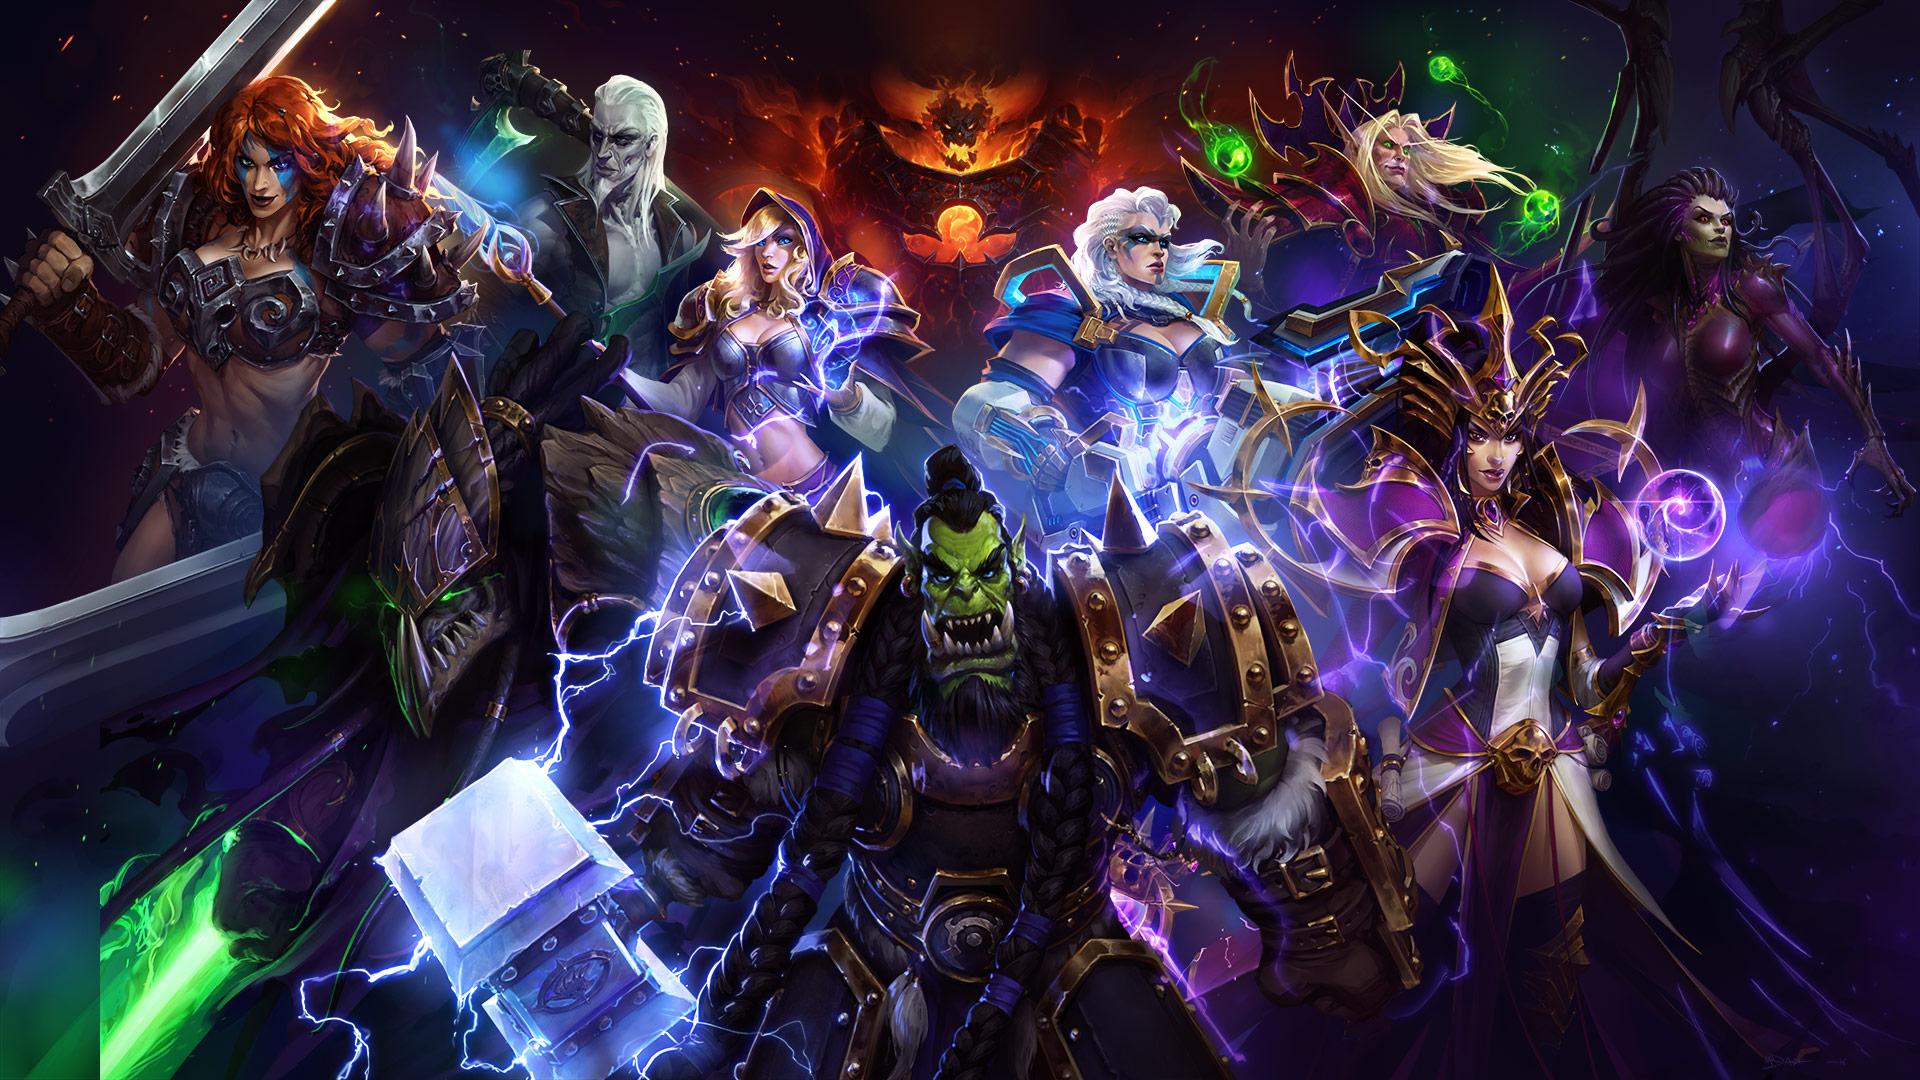 Heroes of the storm new event mechastorm 2 brings new - Heroes of the storm space lord leoric ...